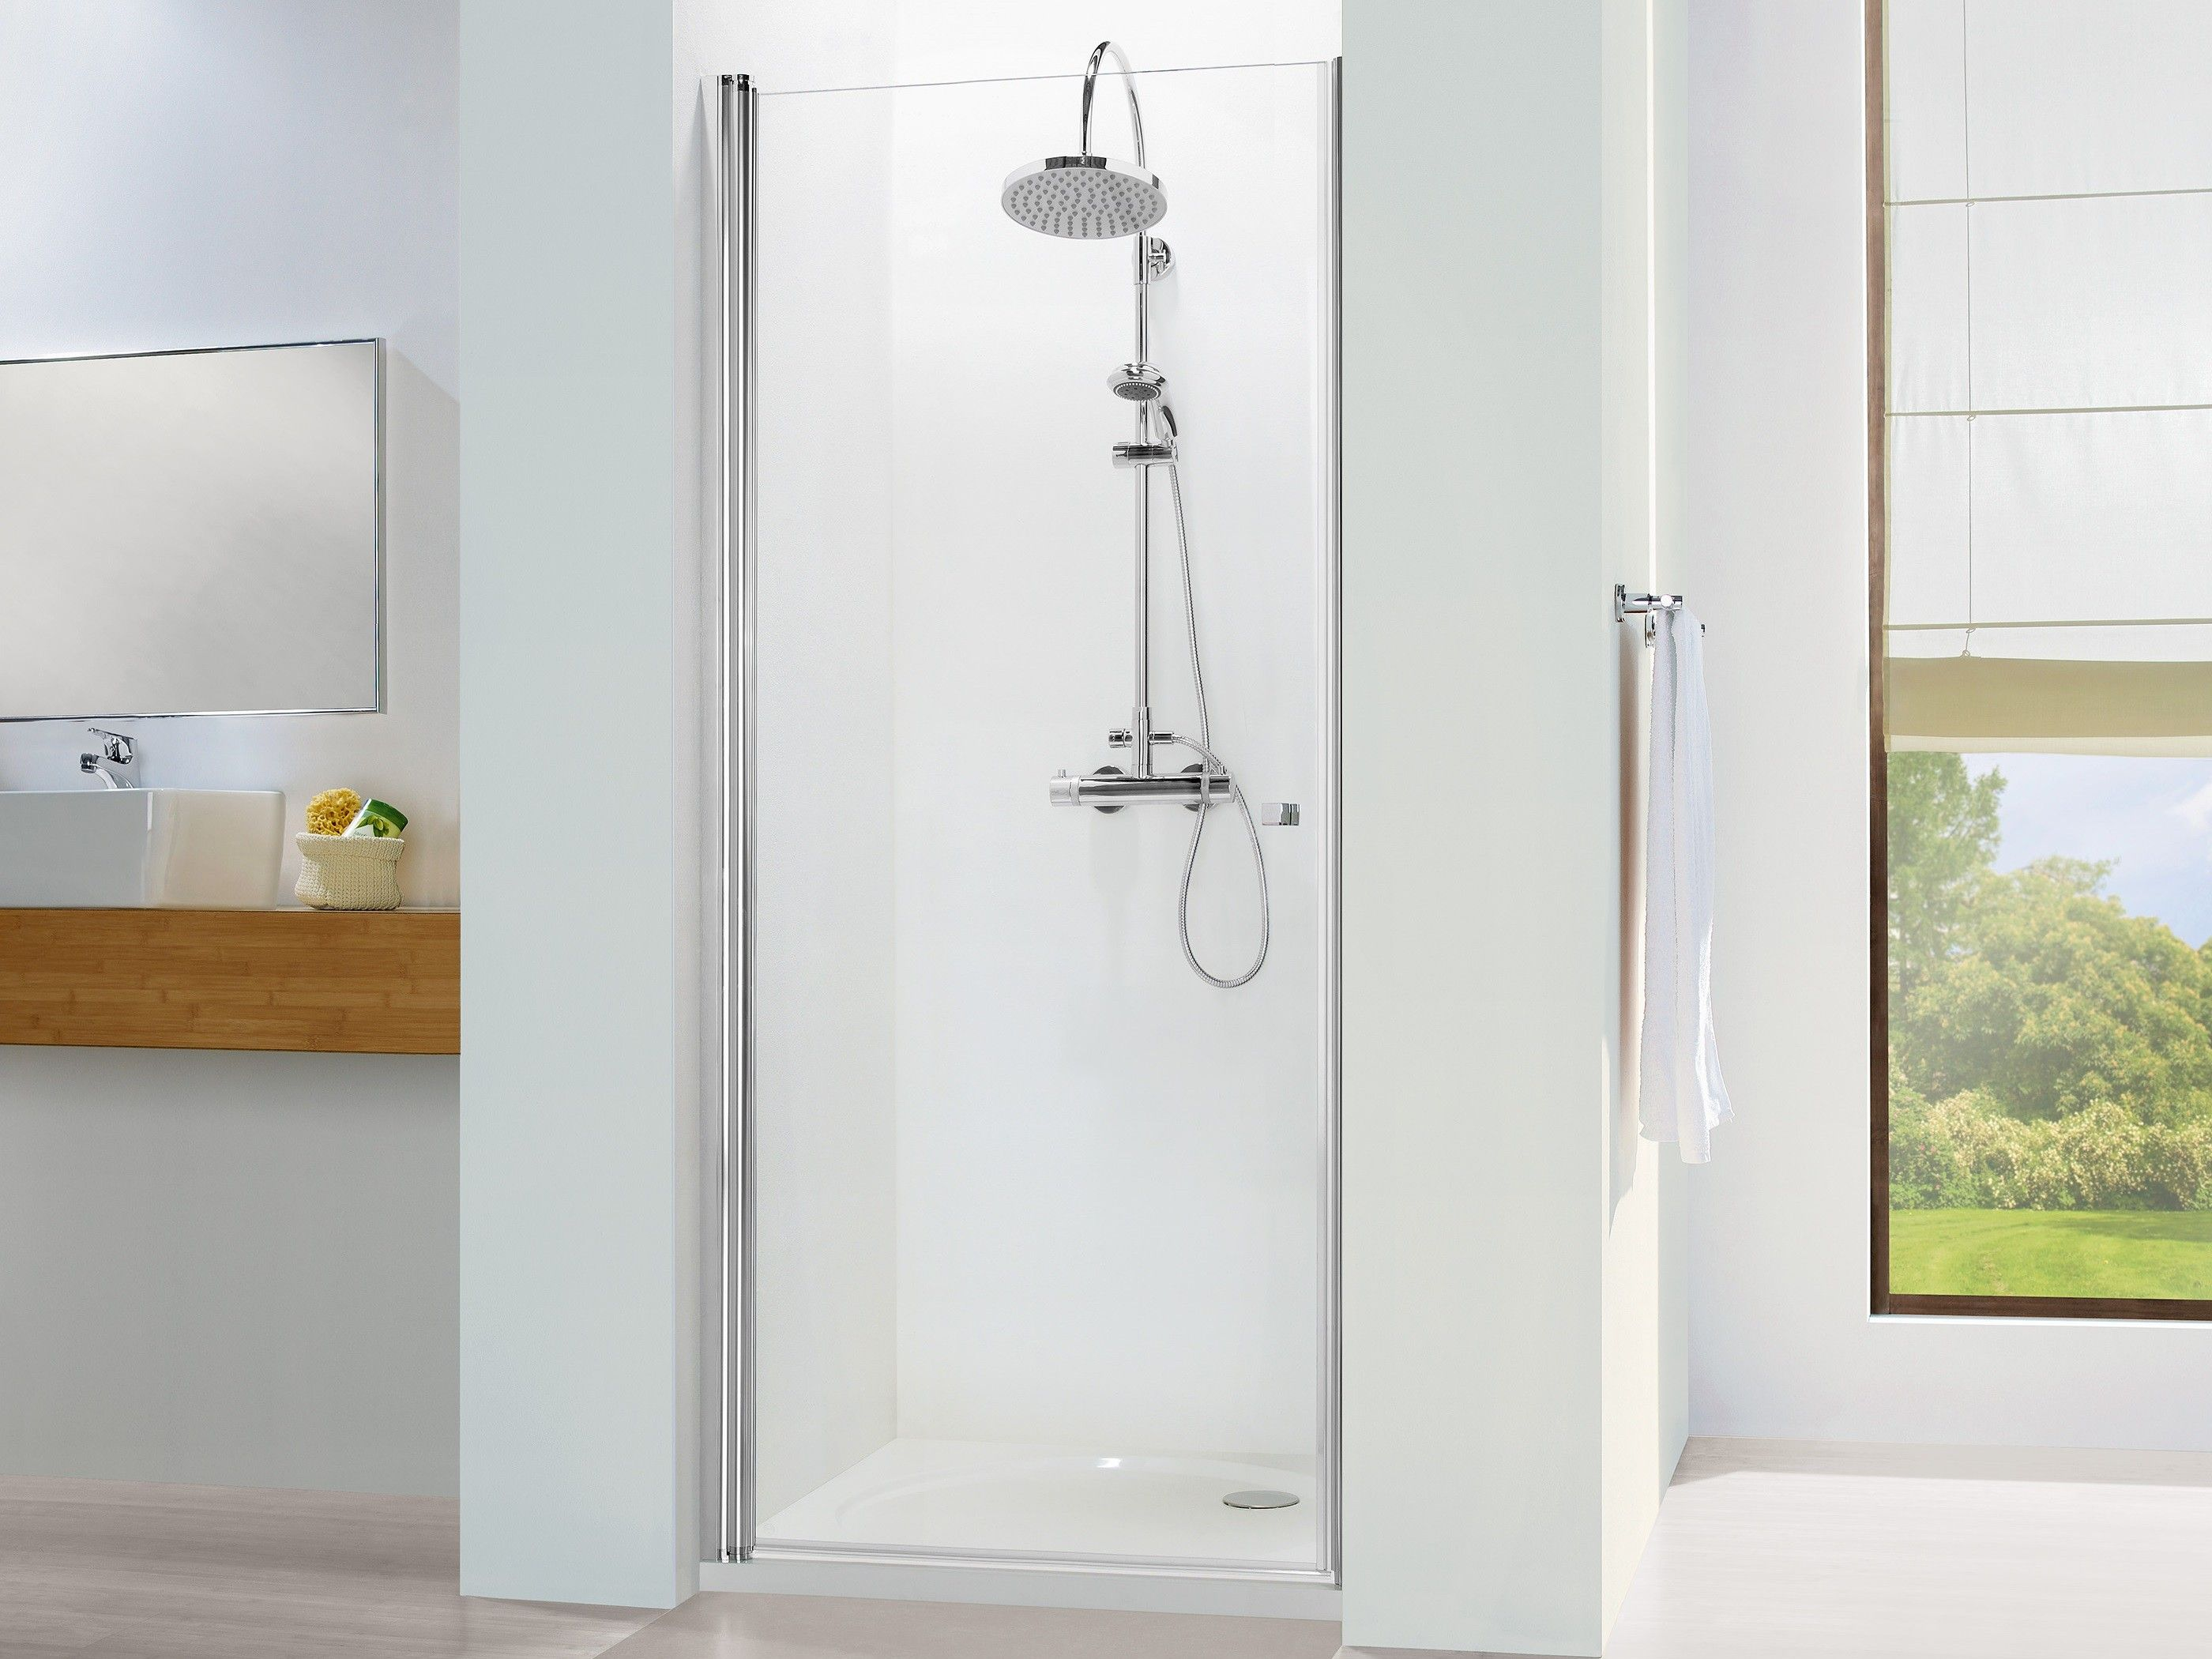 duschabtrennung nische pendelt r 60 x 220 cm duscht ren nischent ren pinterest. Black Bedroom Furniture Sets. Home Design Ideas